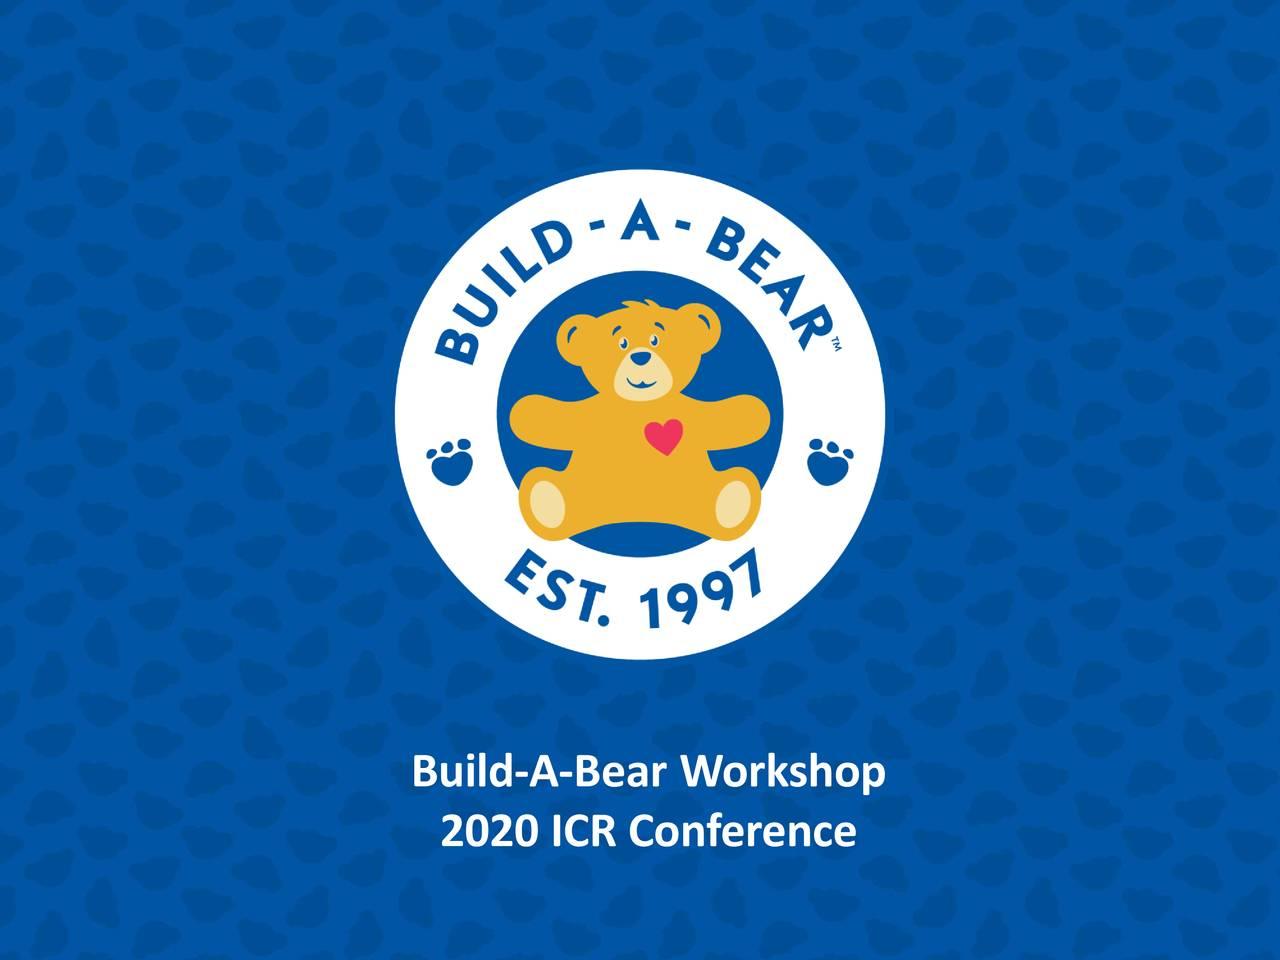 Build-A-Bear Workshop (BBW) Presents At 22nd Annual ICR Xchange Conference - Slideshow - Build-A-Bear Workshop, Inc. (NYSE:BBW)   Seeking Alpha